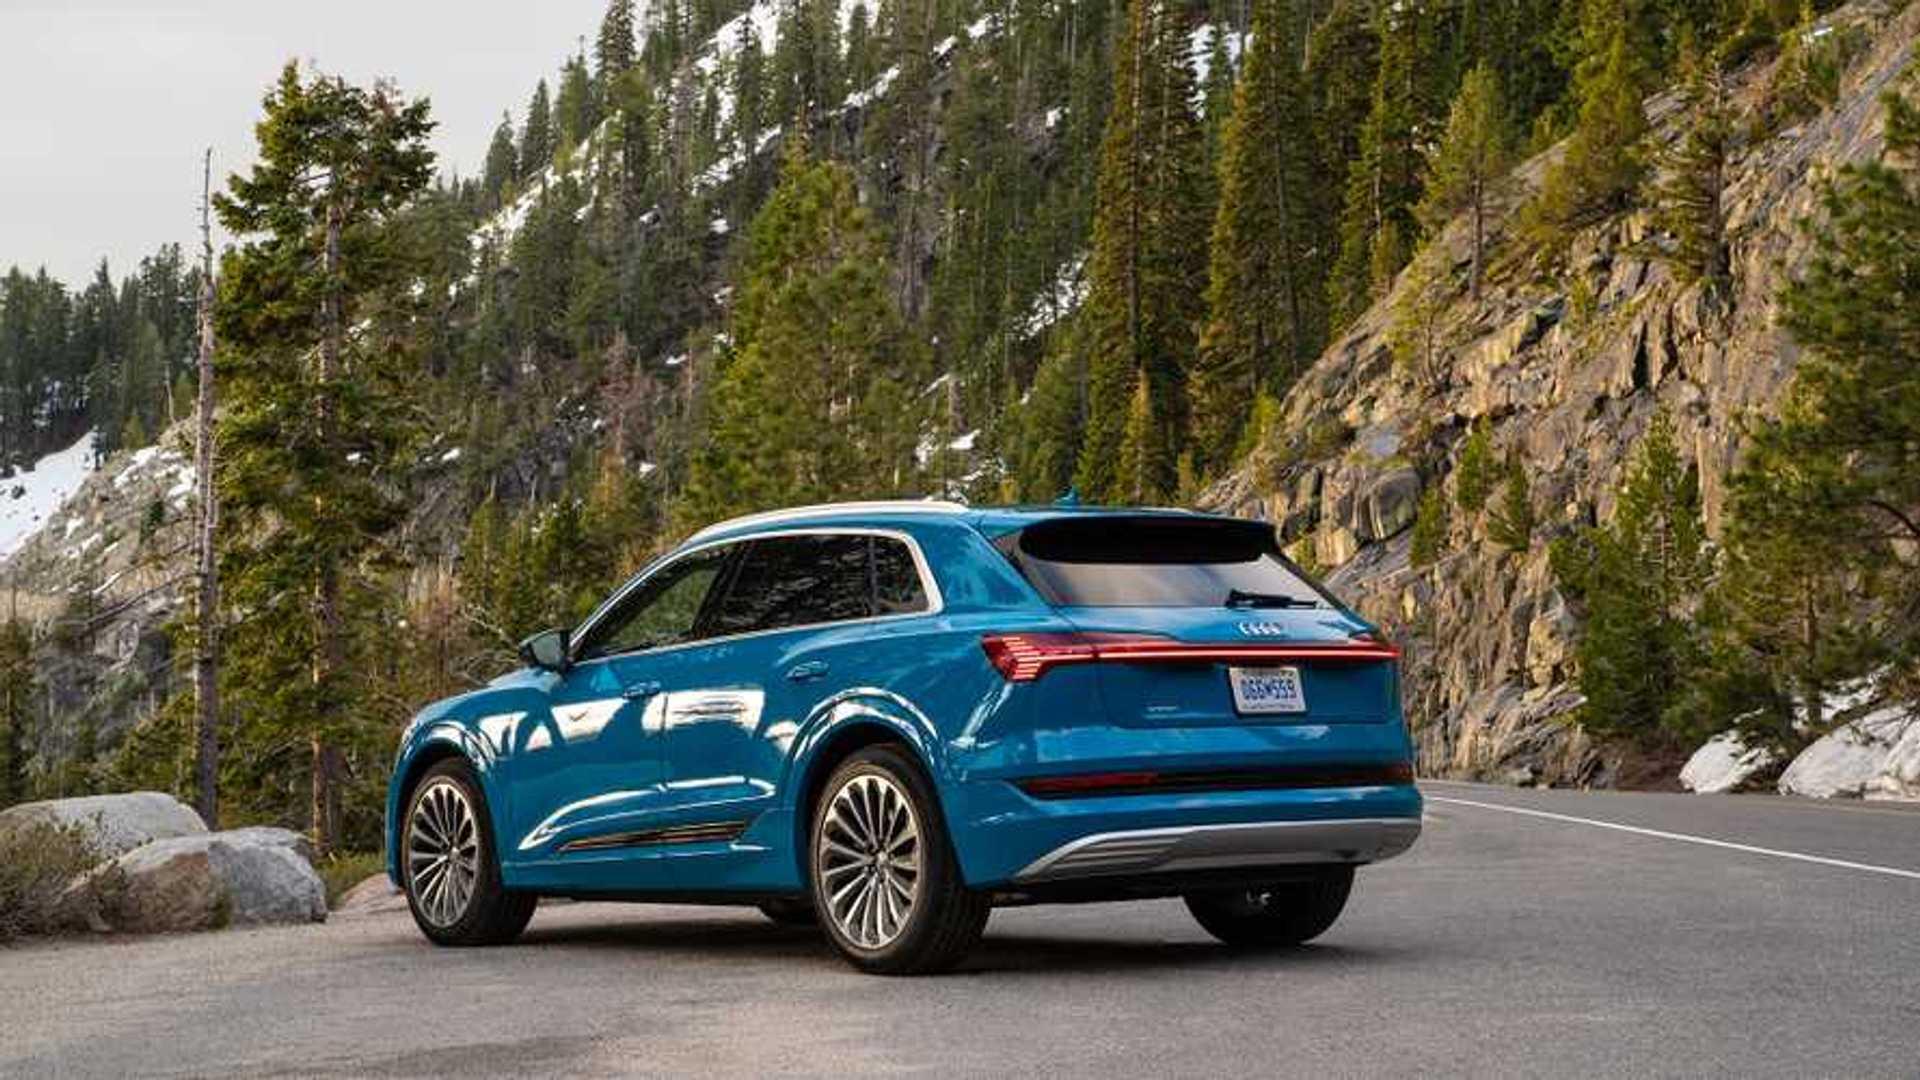 In August, Audi e-tron Sales In U.S. Declined